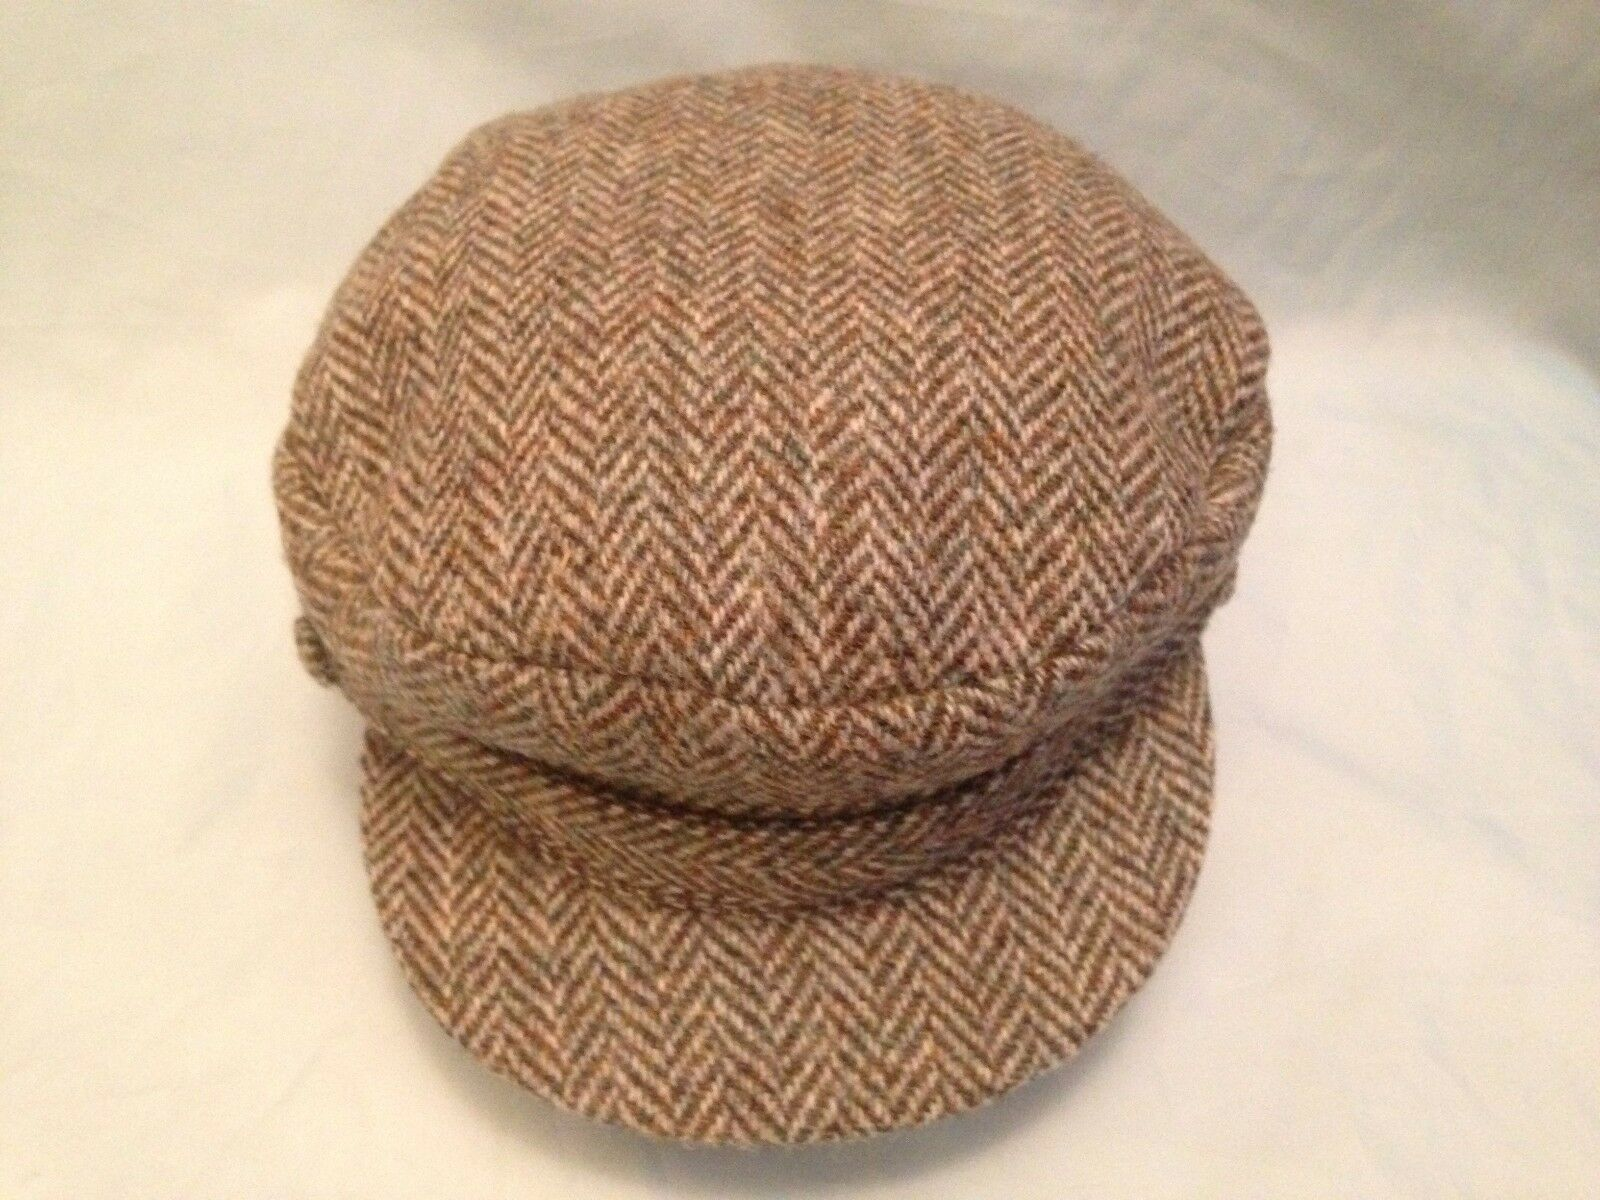 HARRIS TWEED GREEN HERRINGBONE BRETON SAILING BARGE FIDDLER  SAILOR CAP  best prices and freshest styles